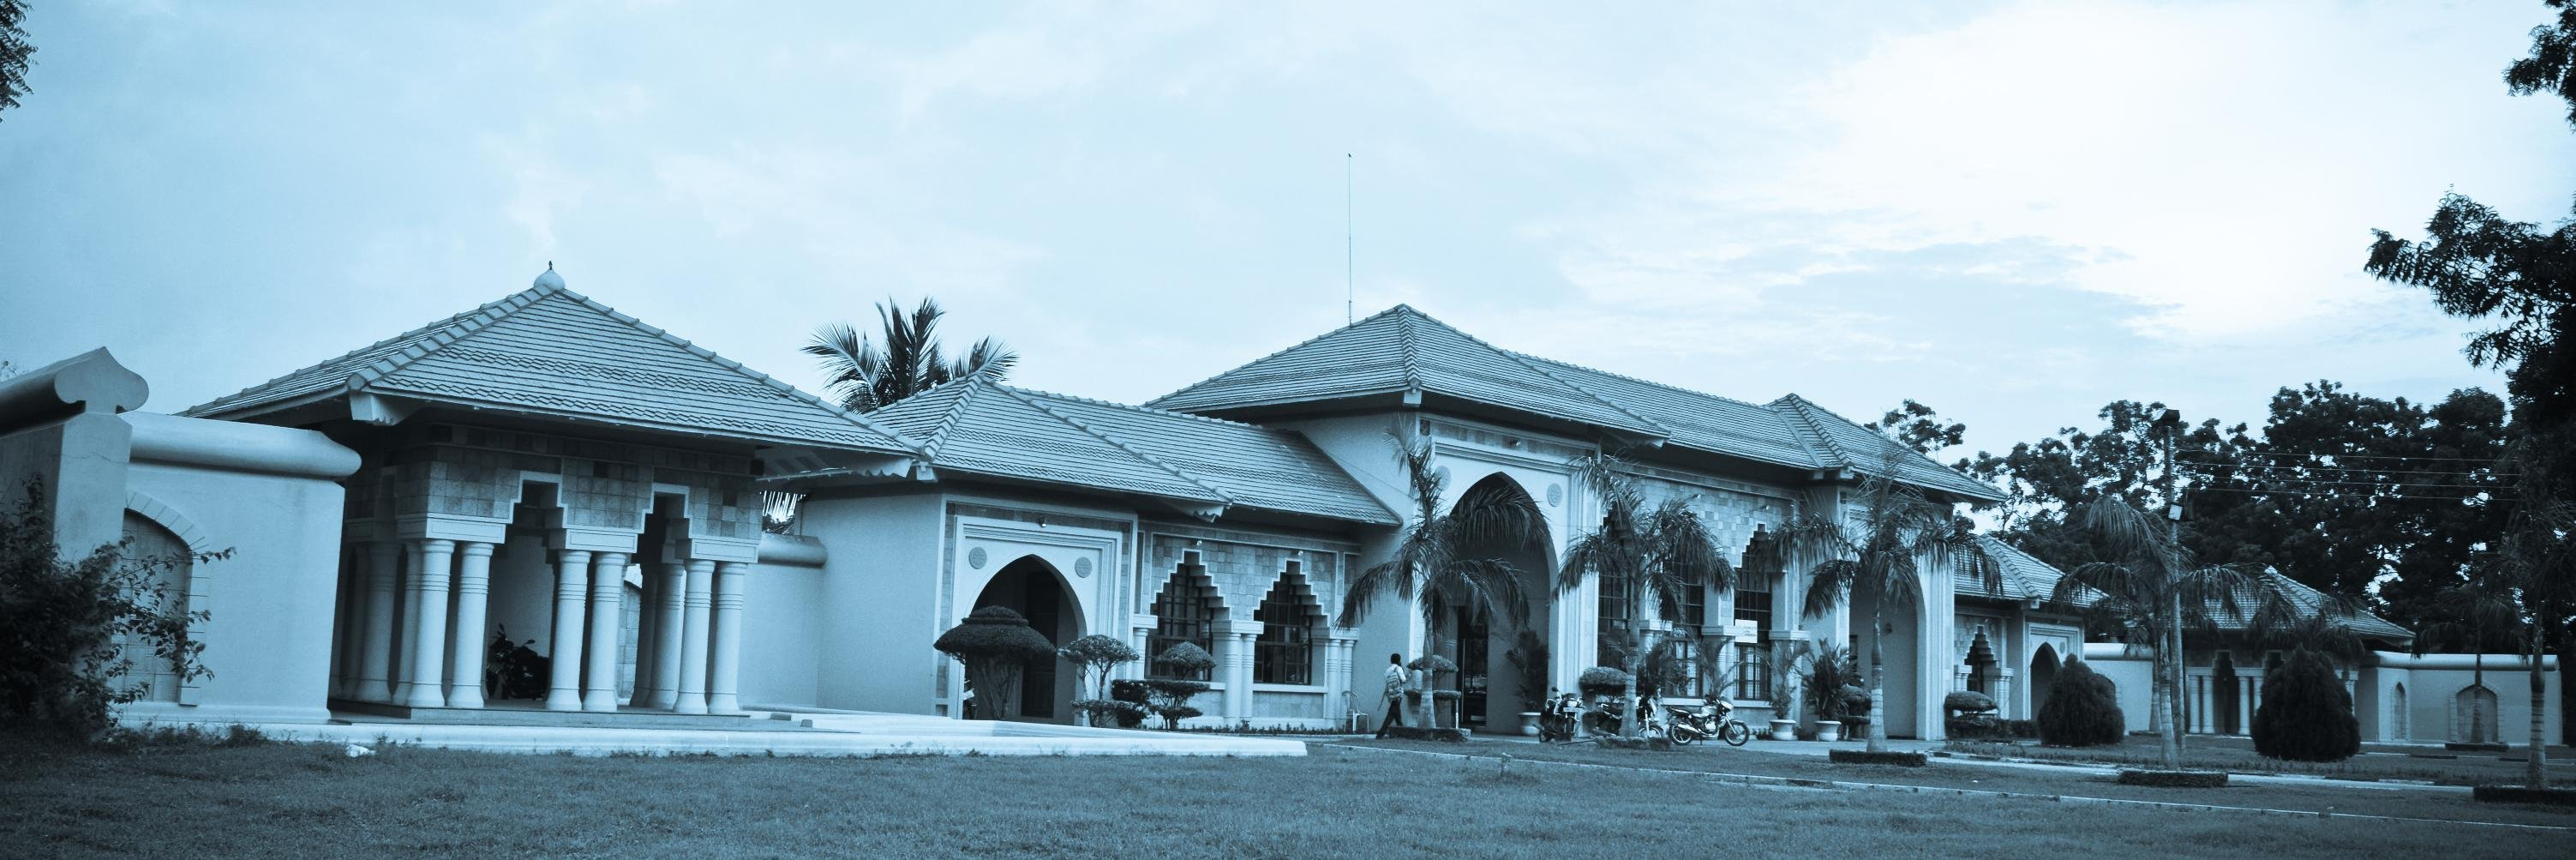 South Eastern University of Sri Lanka's official Twitter account